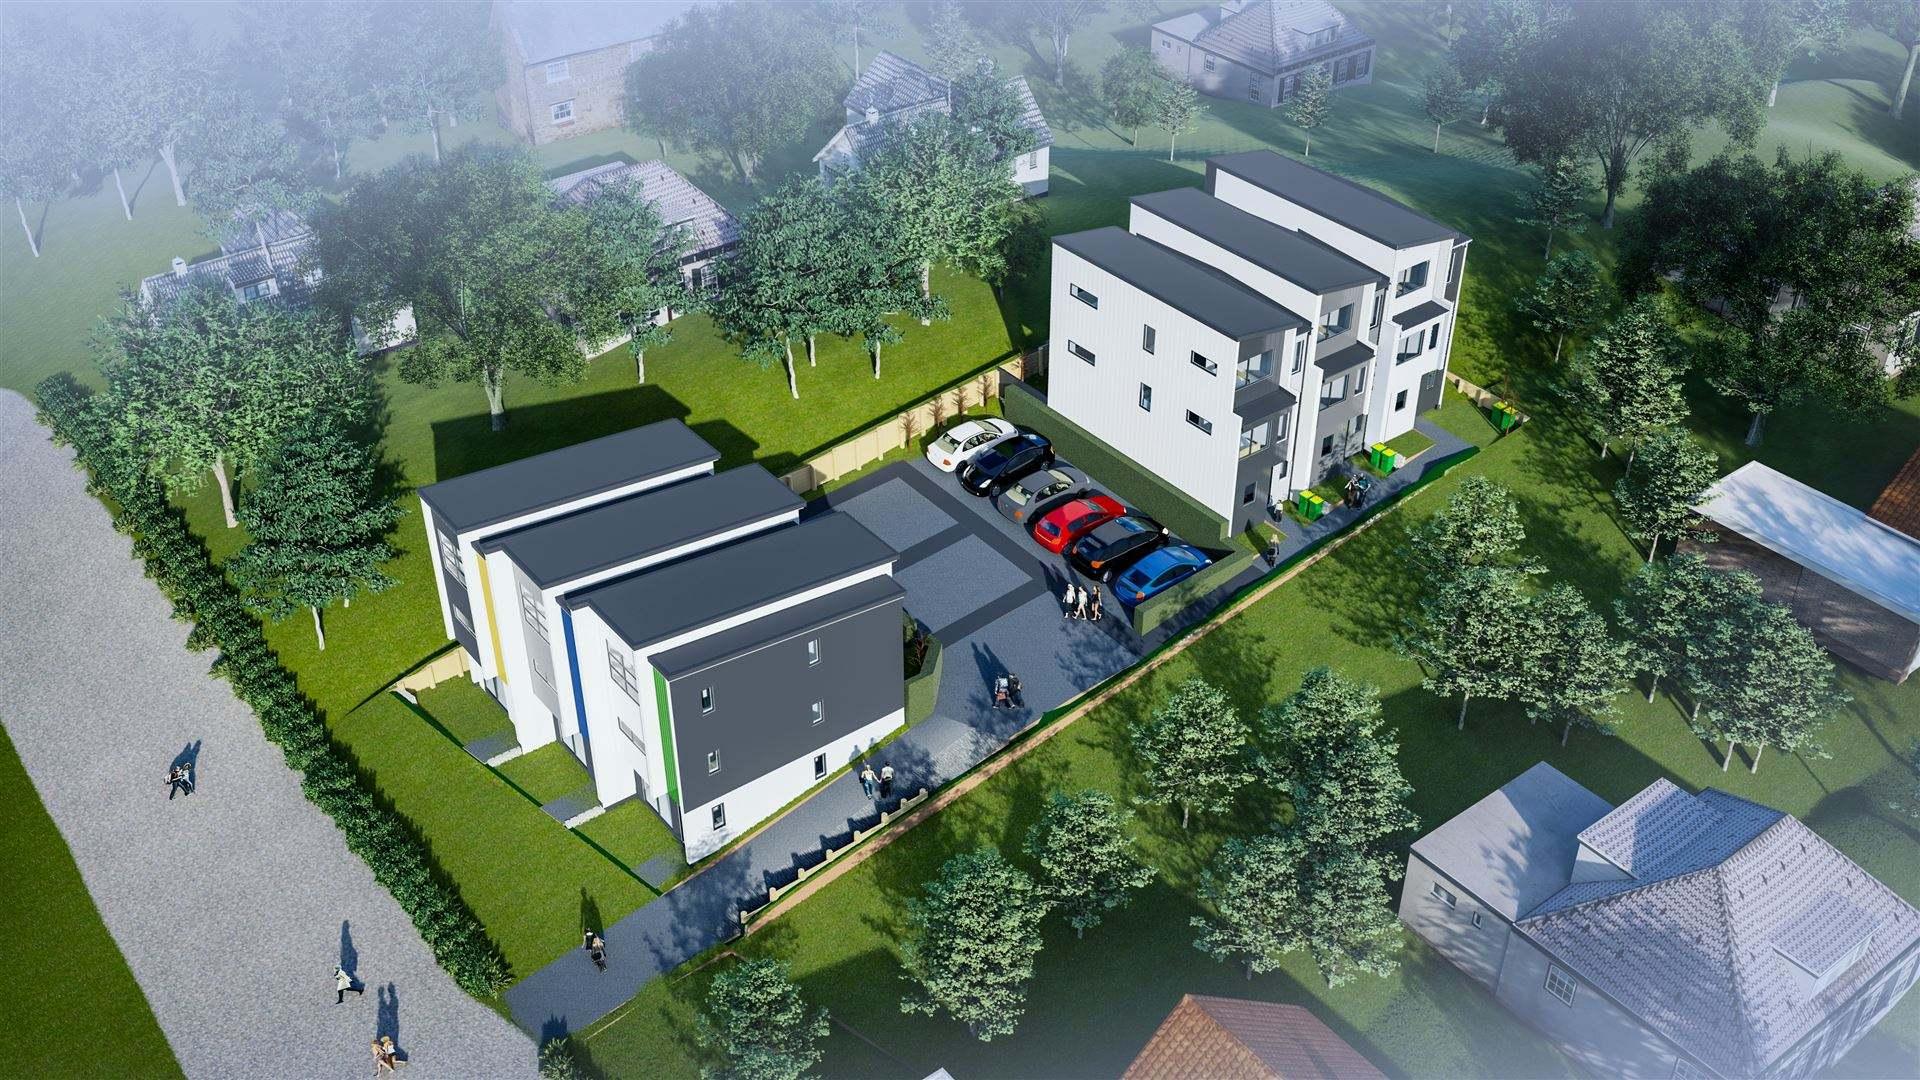 Glenfield 3房 全新性价比城市屋 两种不同户型 好校云集 配套醇熟 投资&自住两相宜! Stunning Affordable Brand New Home